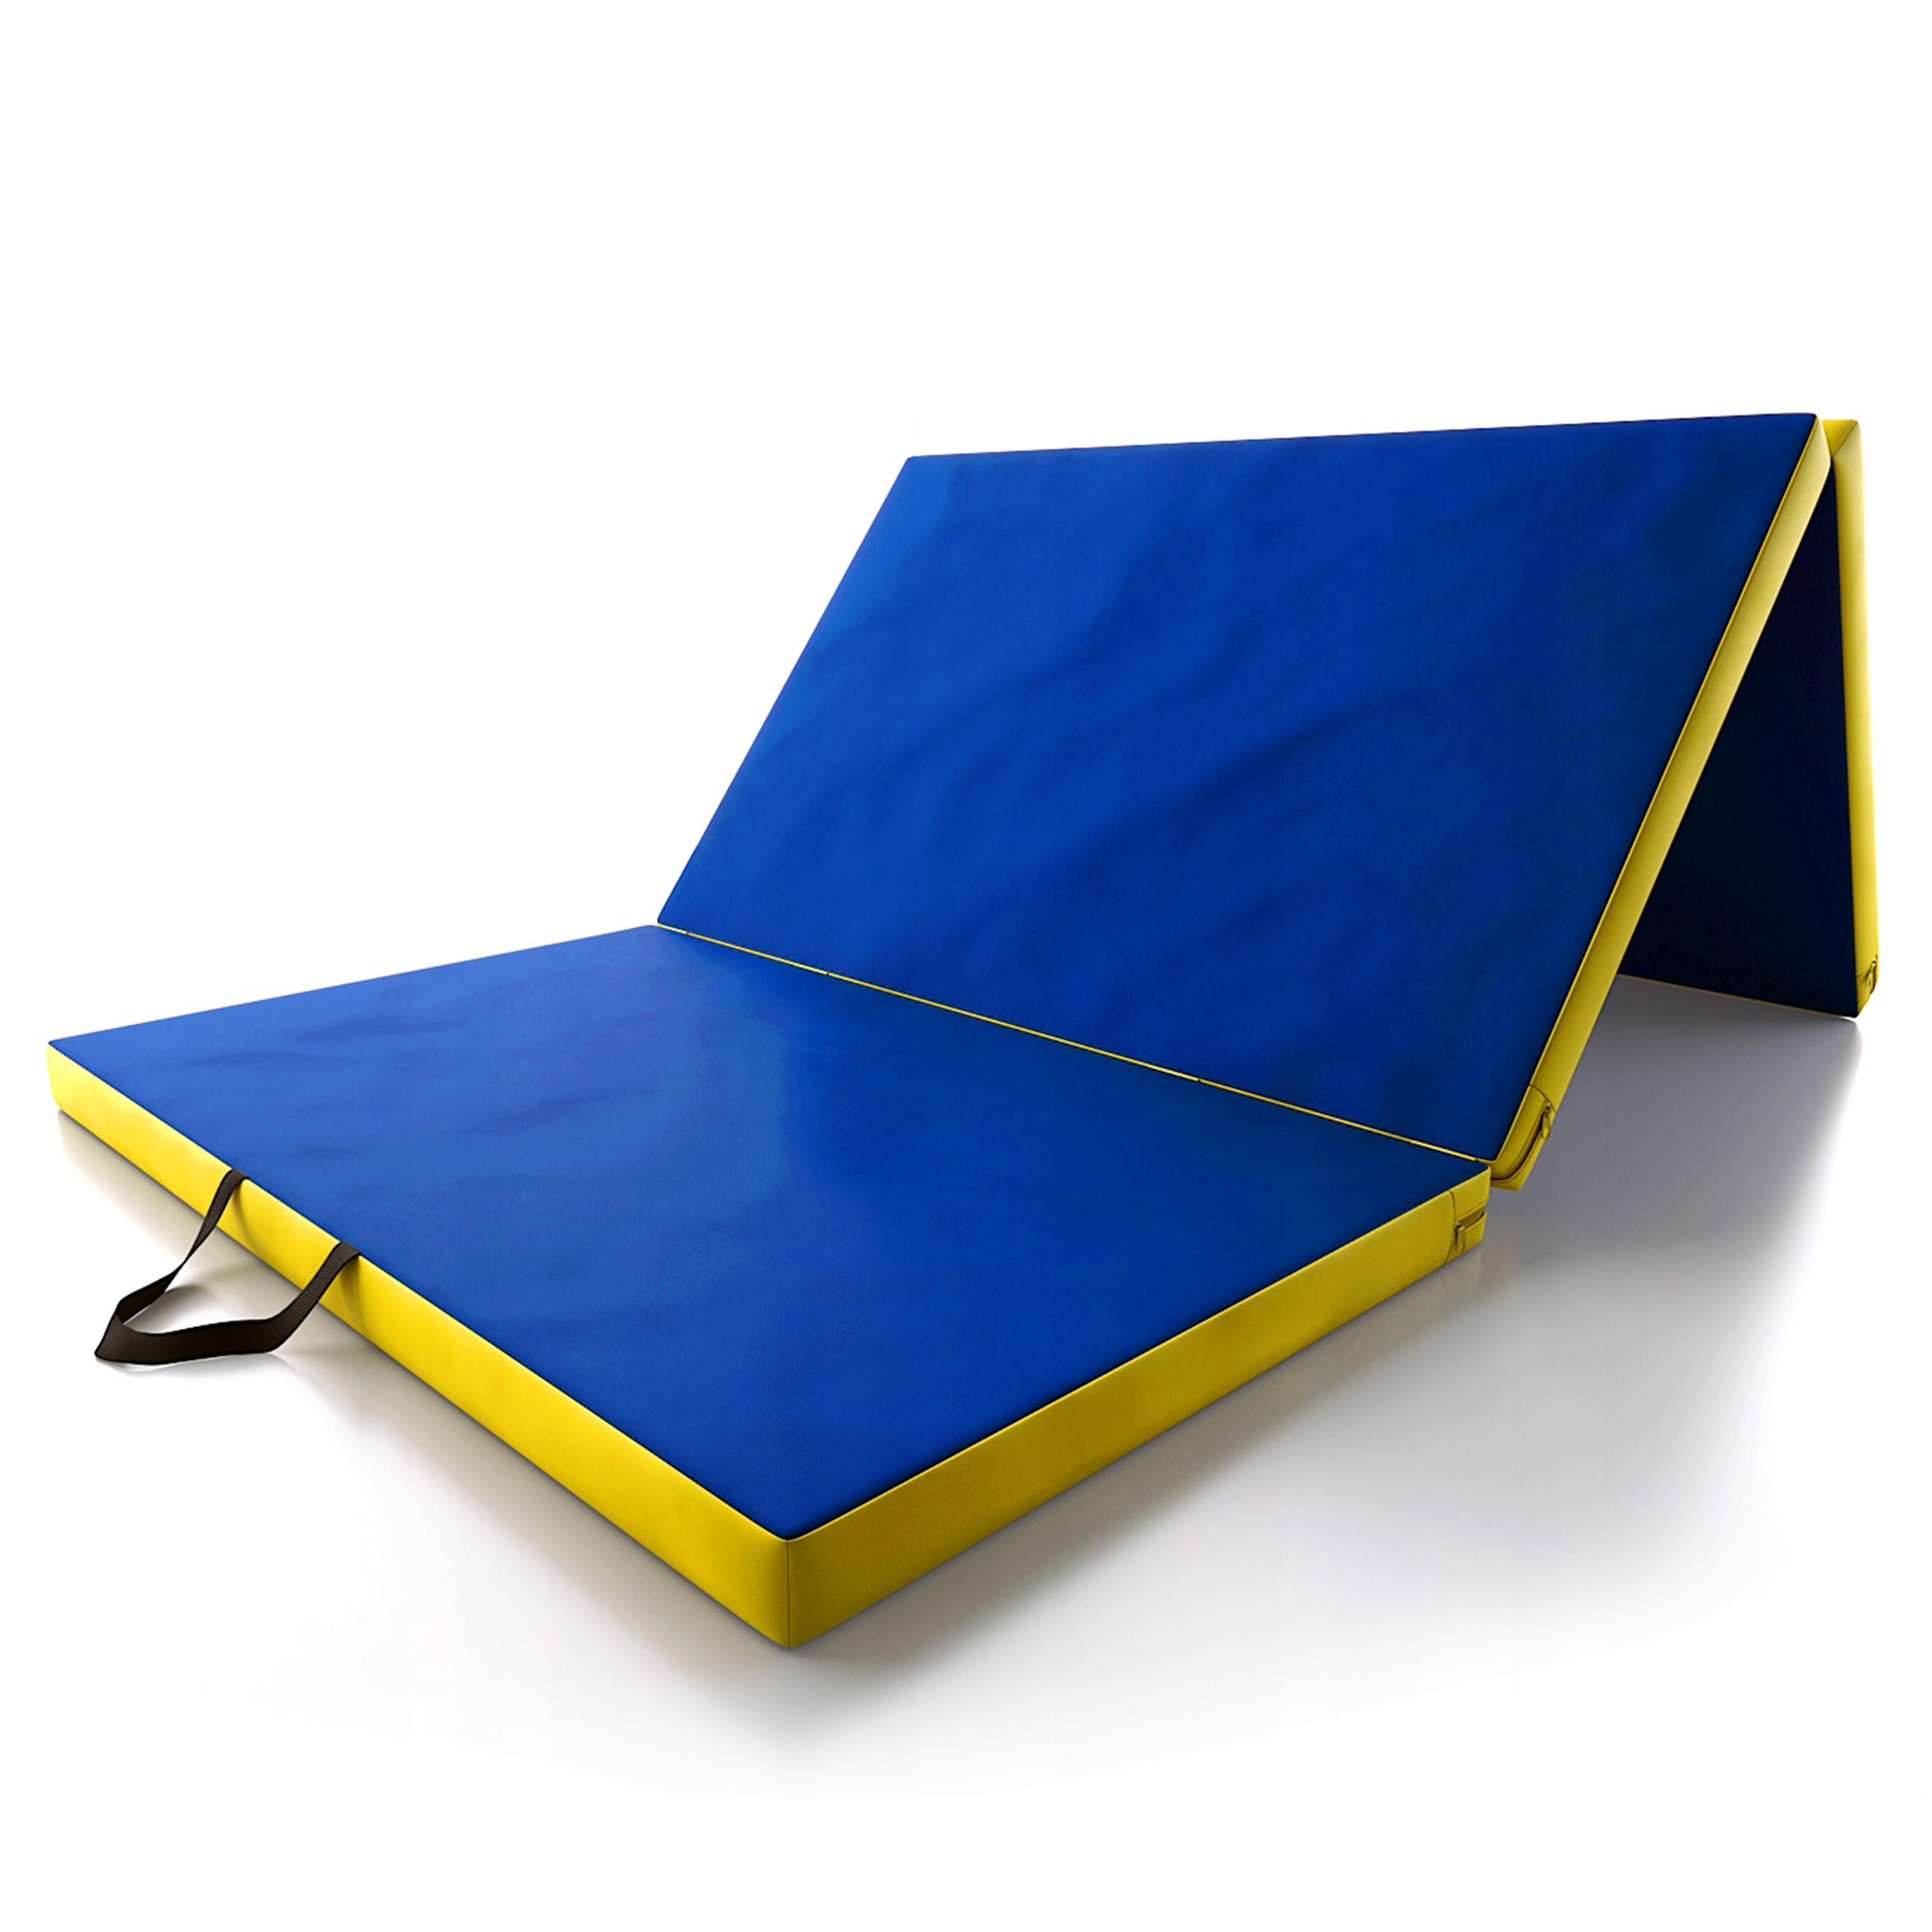 210x140 mega rehabilitačný gymnastický matrac